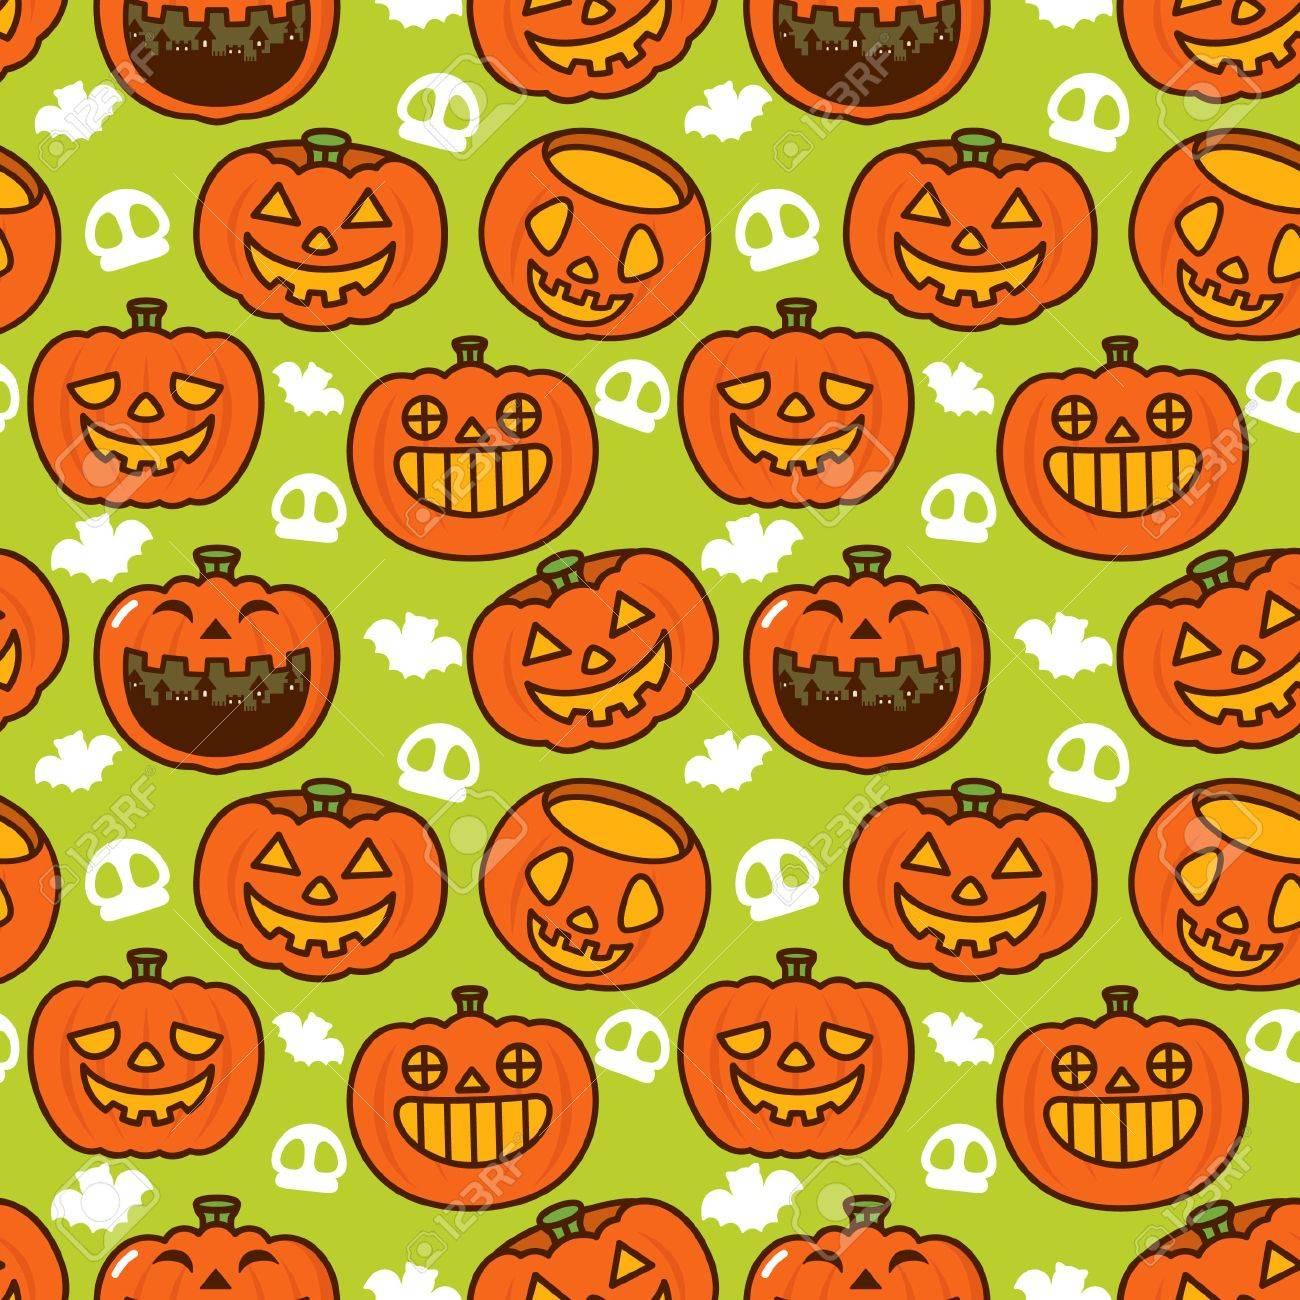 Halloween Pumpkin Pattern Stock Vector - 8084917